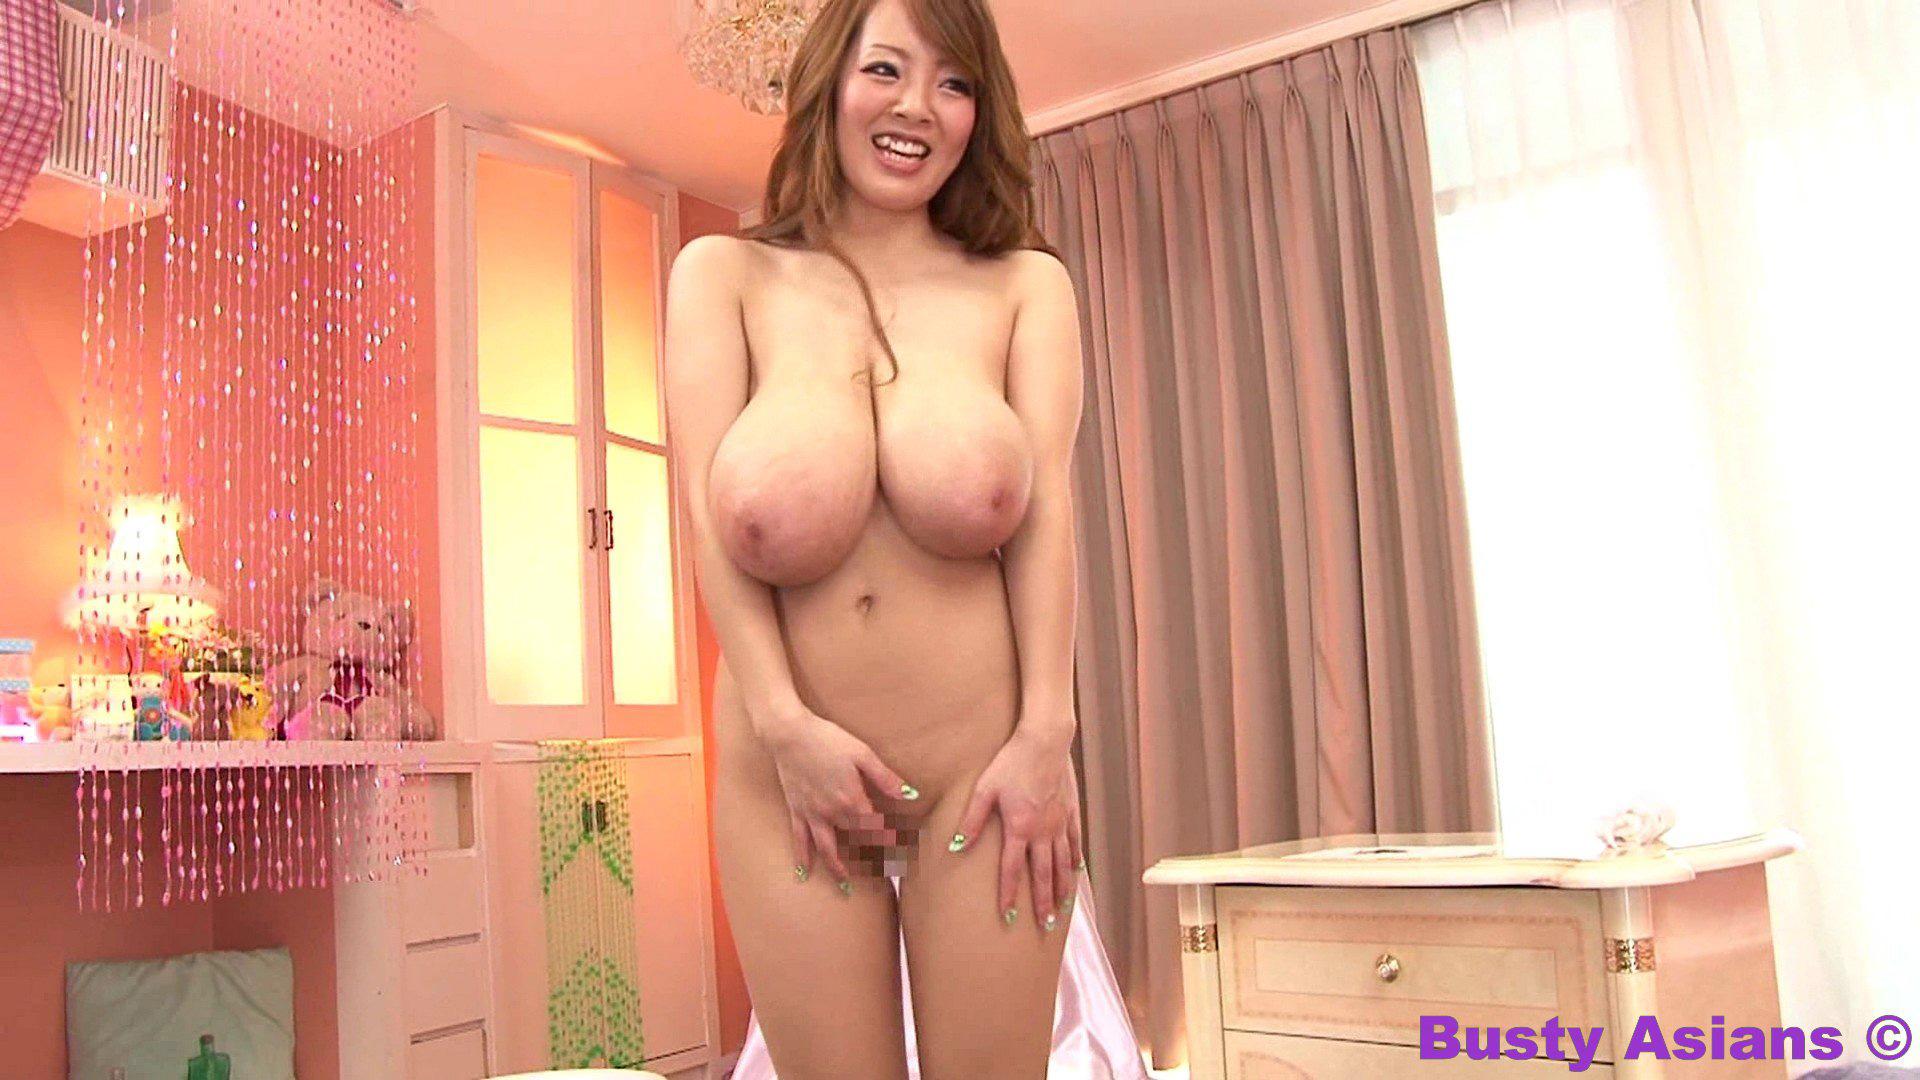 2 big breast: